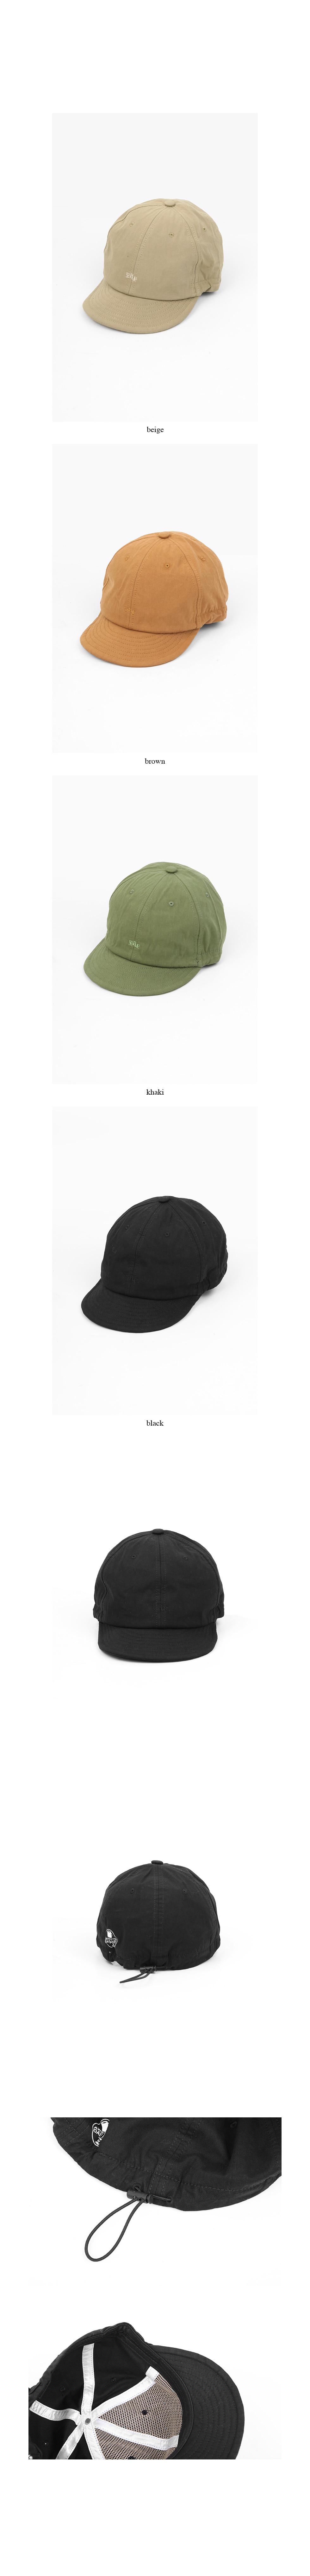 snug sporty cap